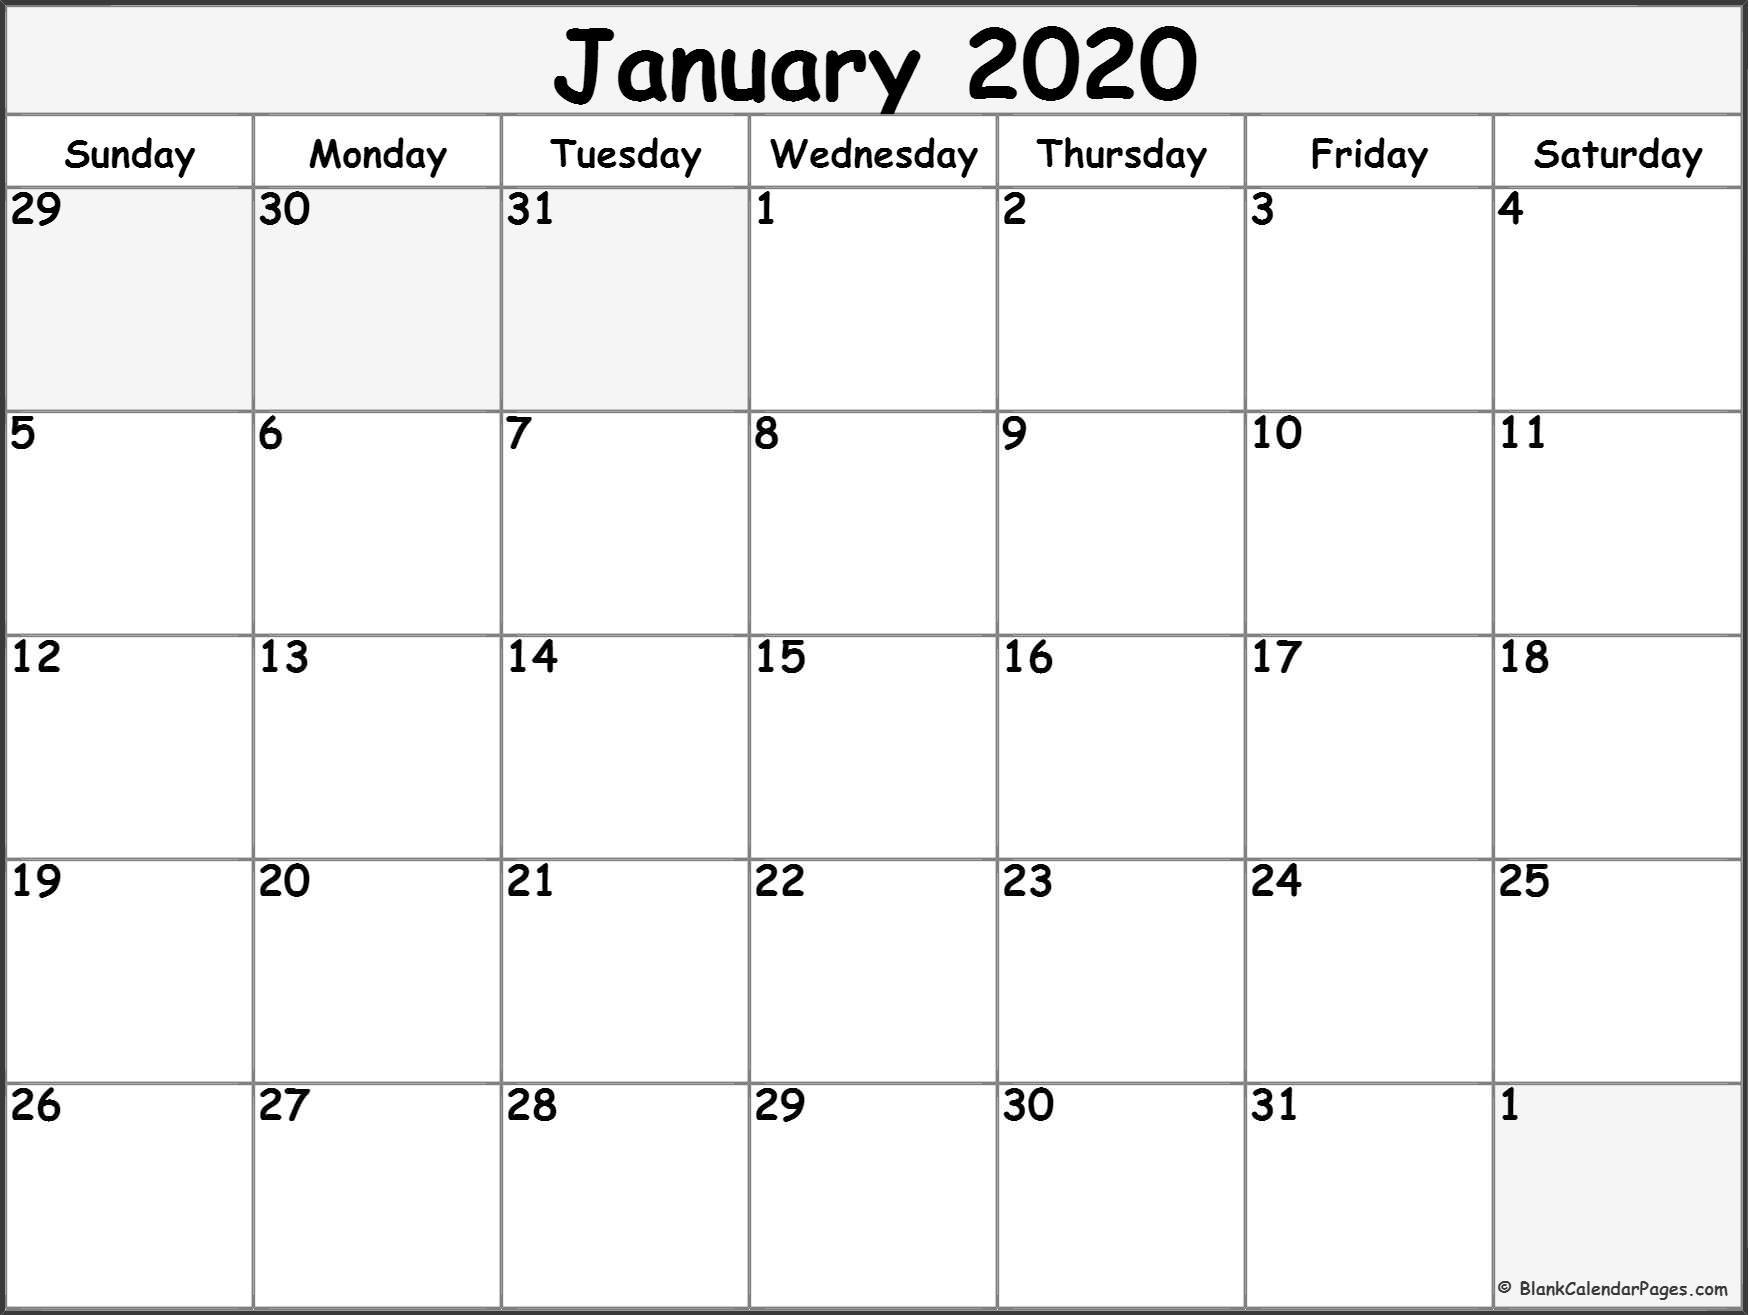 January 2020 Calendar | Free Printable Monthly Calendars-Blank 3 Month Calendar 2020 Printable